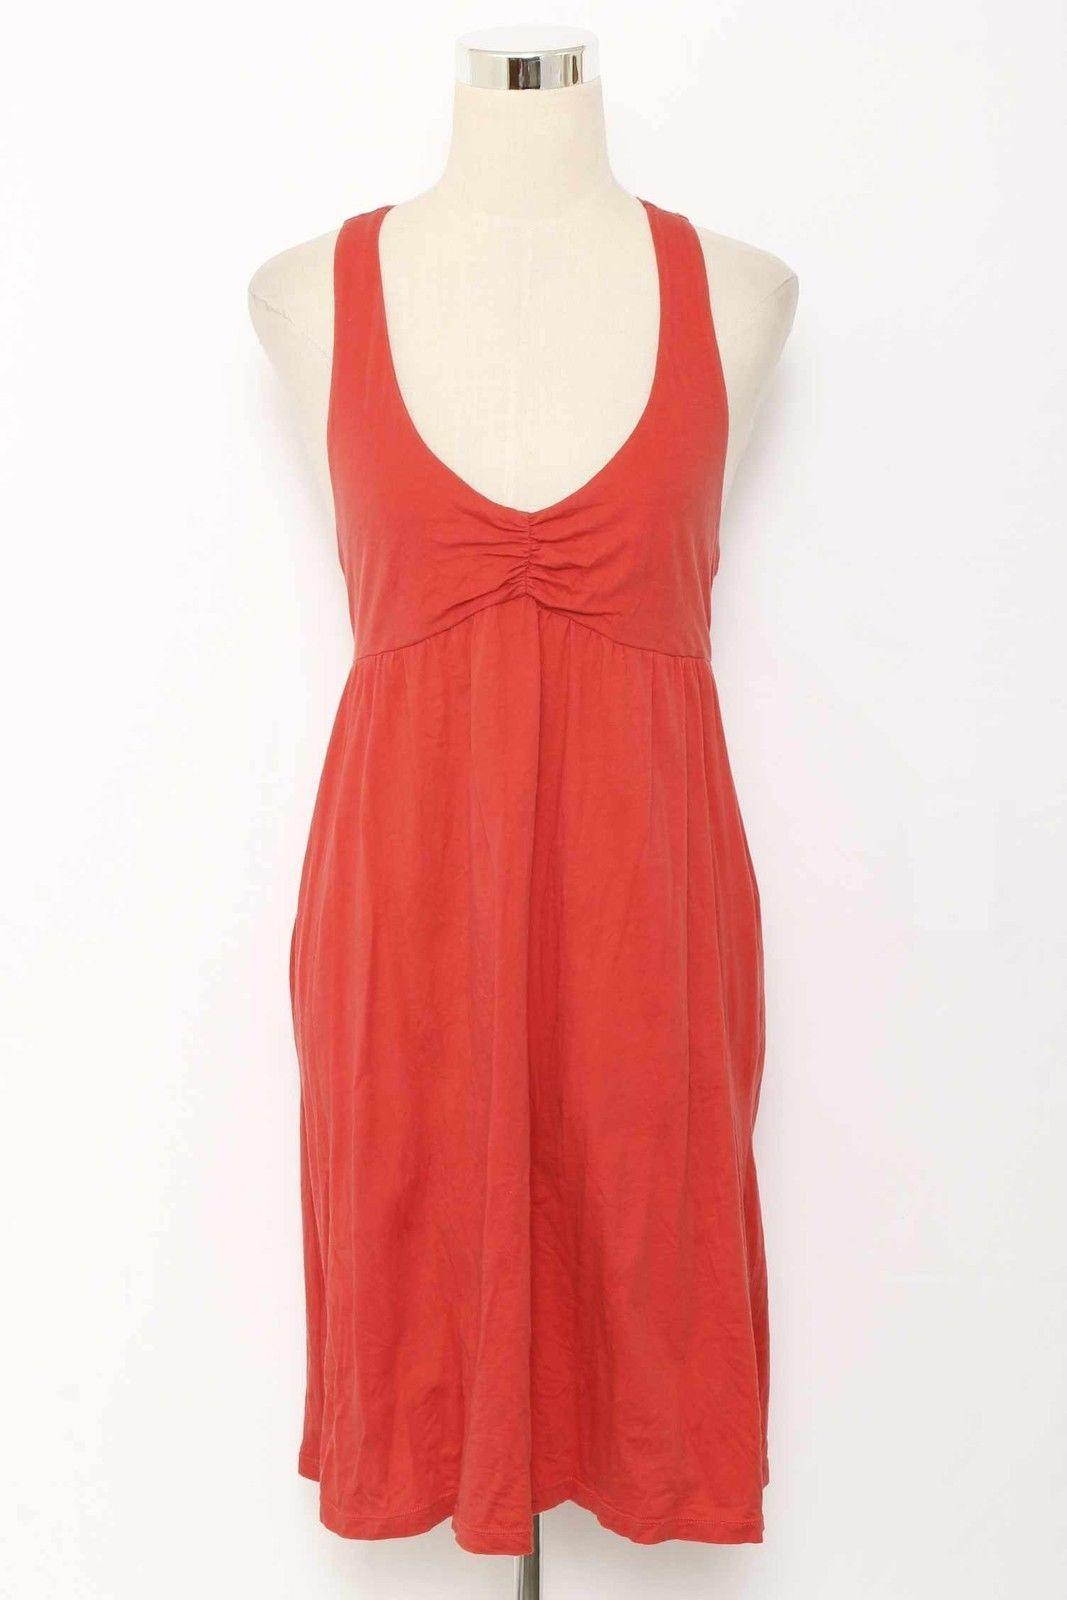 Lilka dark coral empire waist vneck racerback cotton dress size m